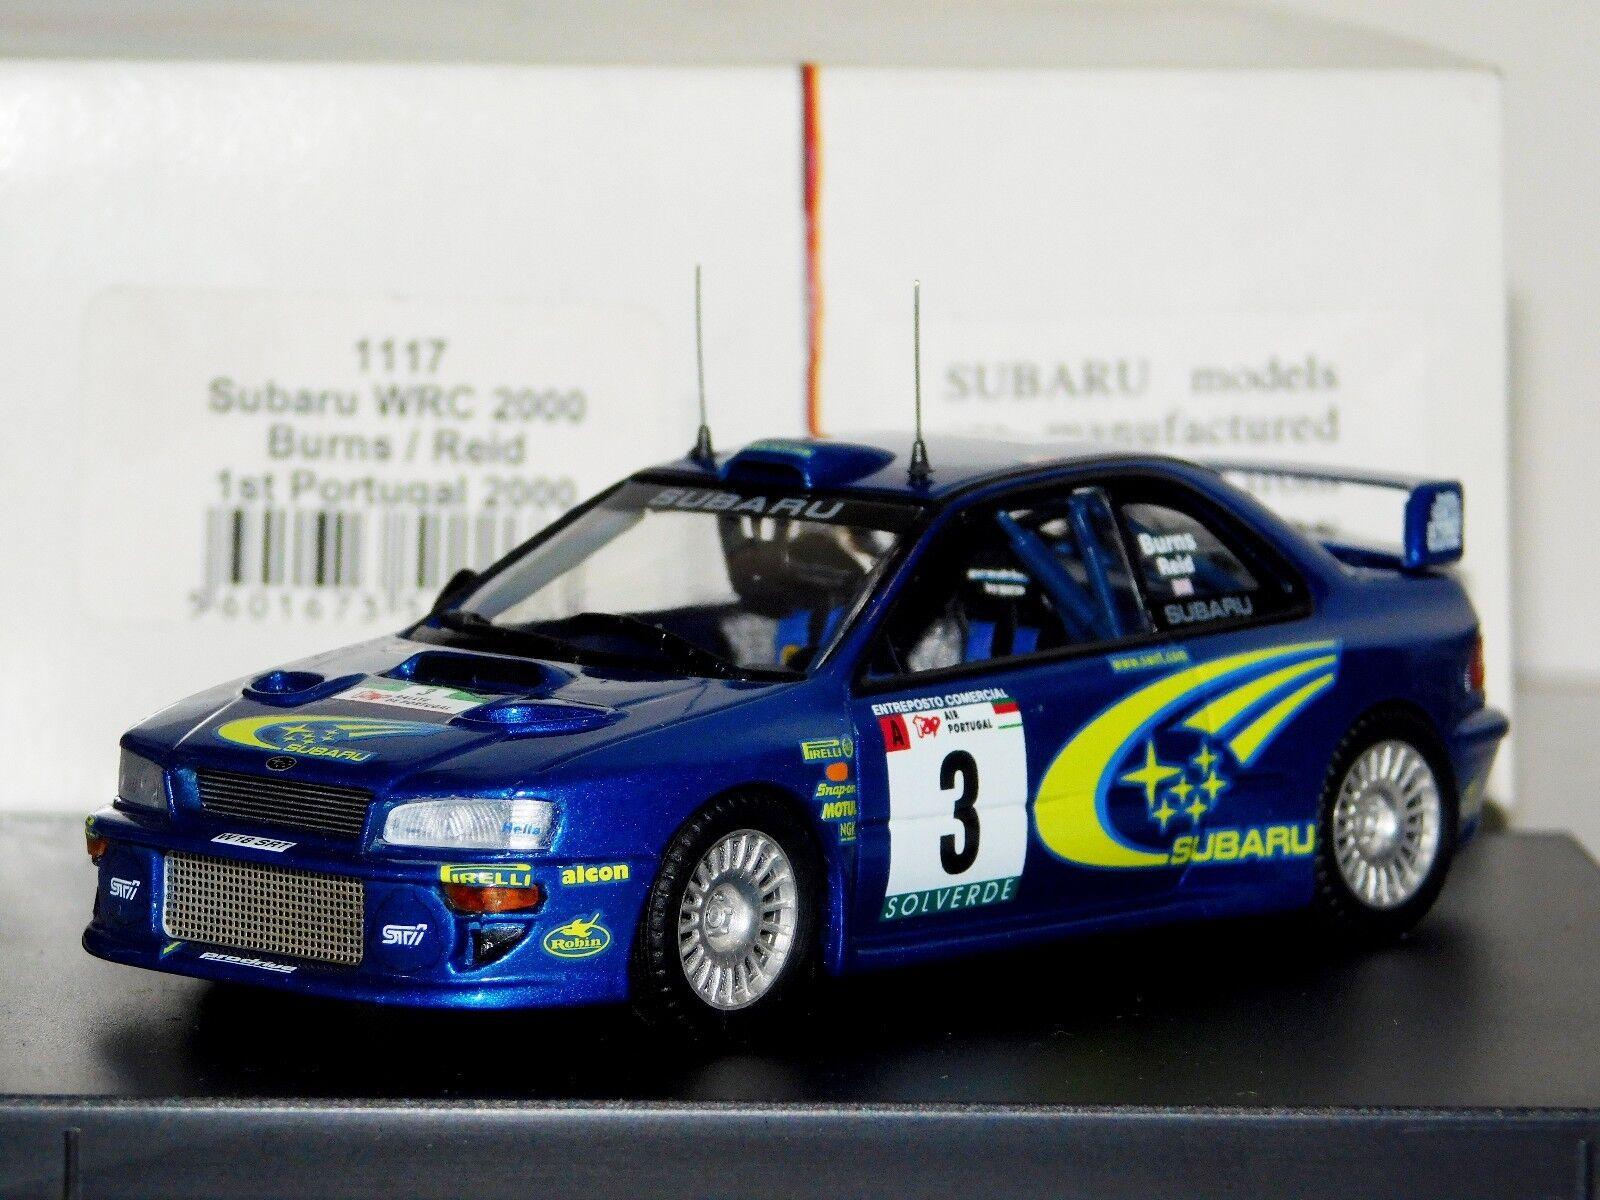 nuevo listado Subaru Impreza WRC  3 Winner Portugal Portugal Portugal 2000 quemaduras Reid Trofeu 1117 1 43  mejor marca